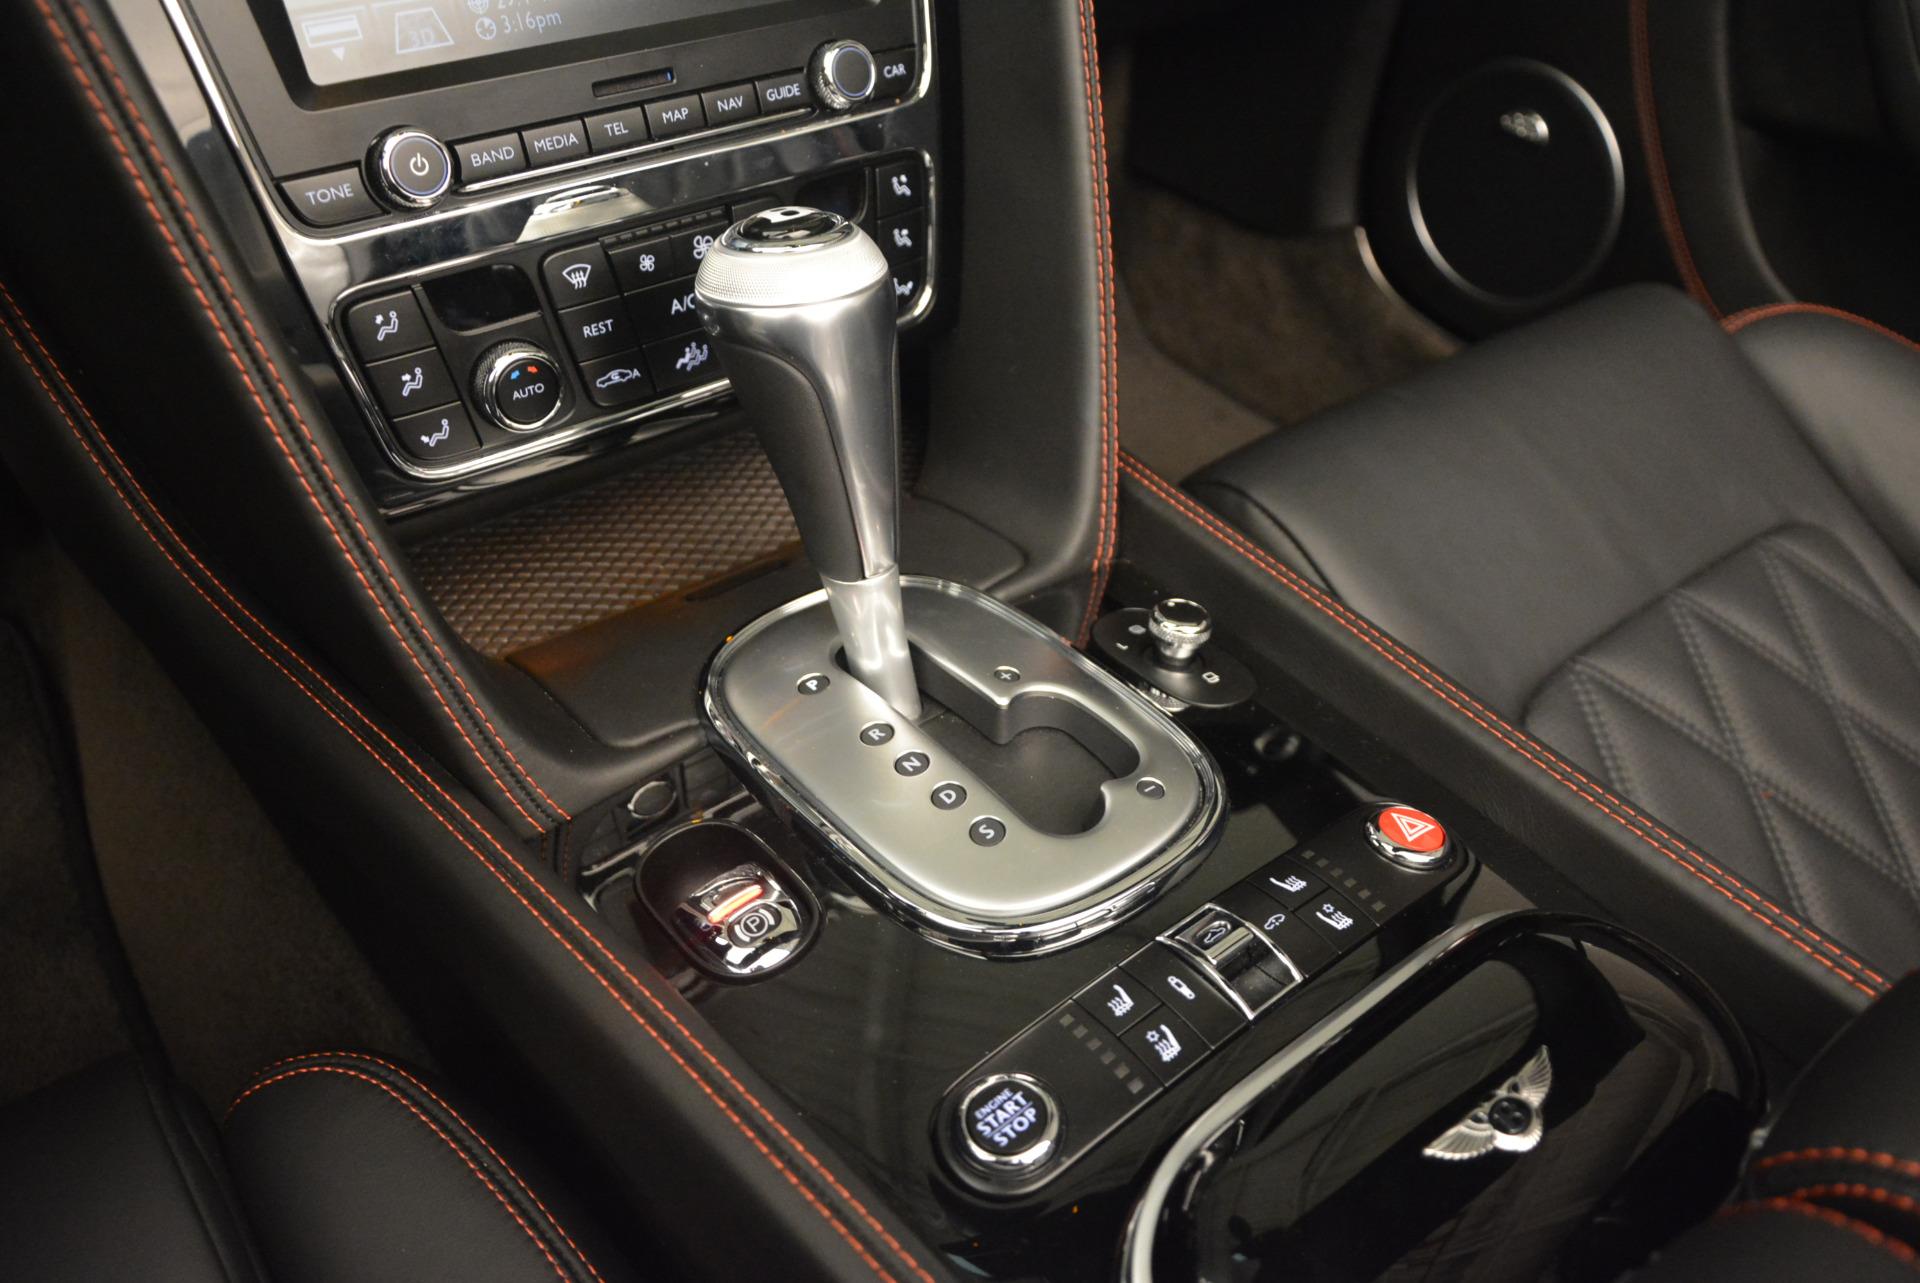 Used 2014 Bentley Continental GT Speed For Sale In Westport, CT 1129_p35